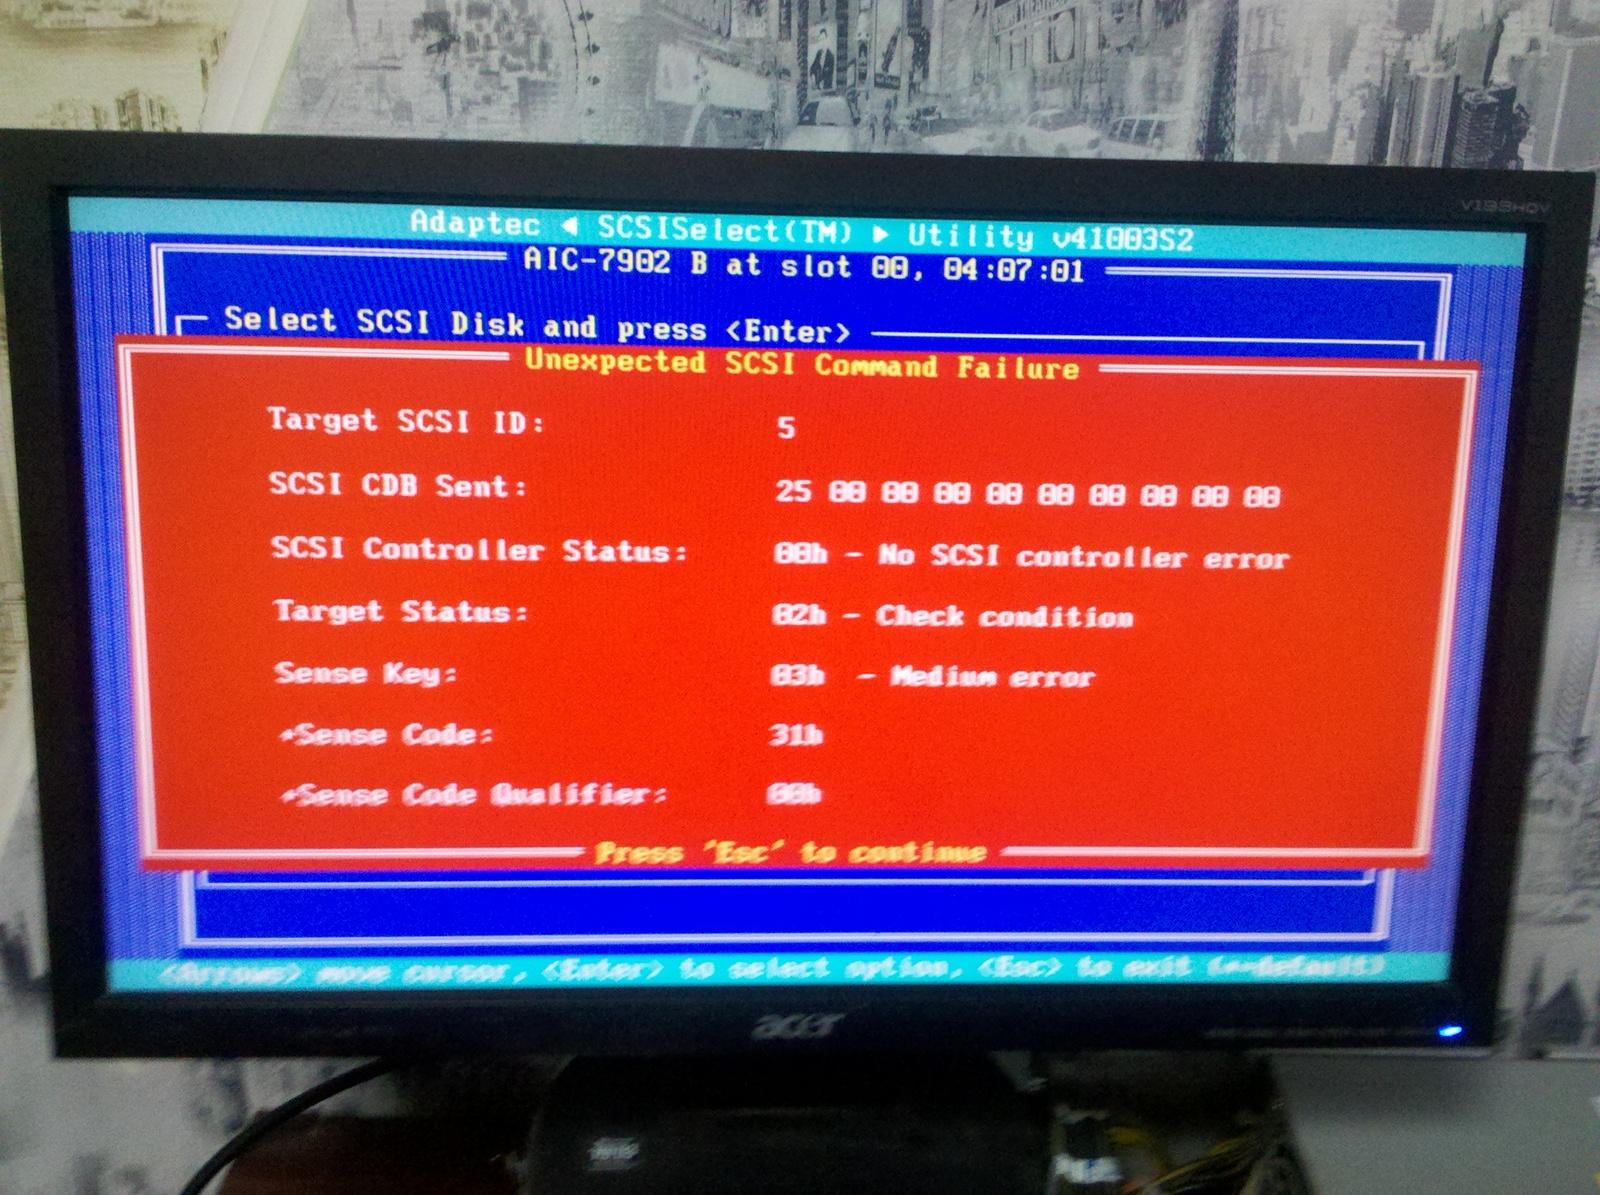 SCSI HDD (ULTRA320) в Adaptec HostRaid Utility видится но не